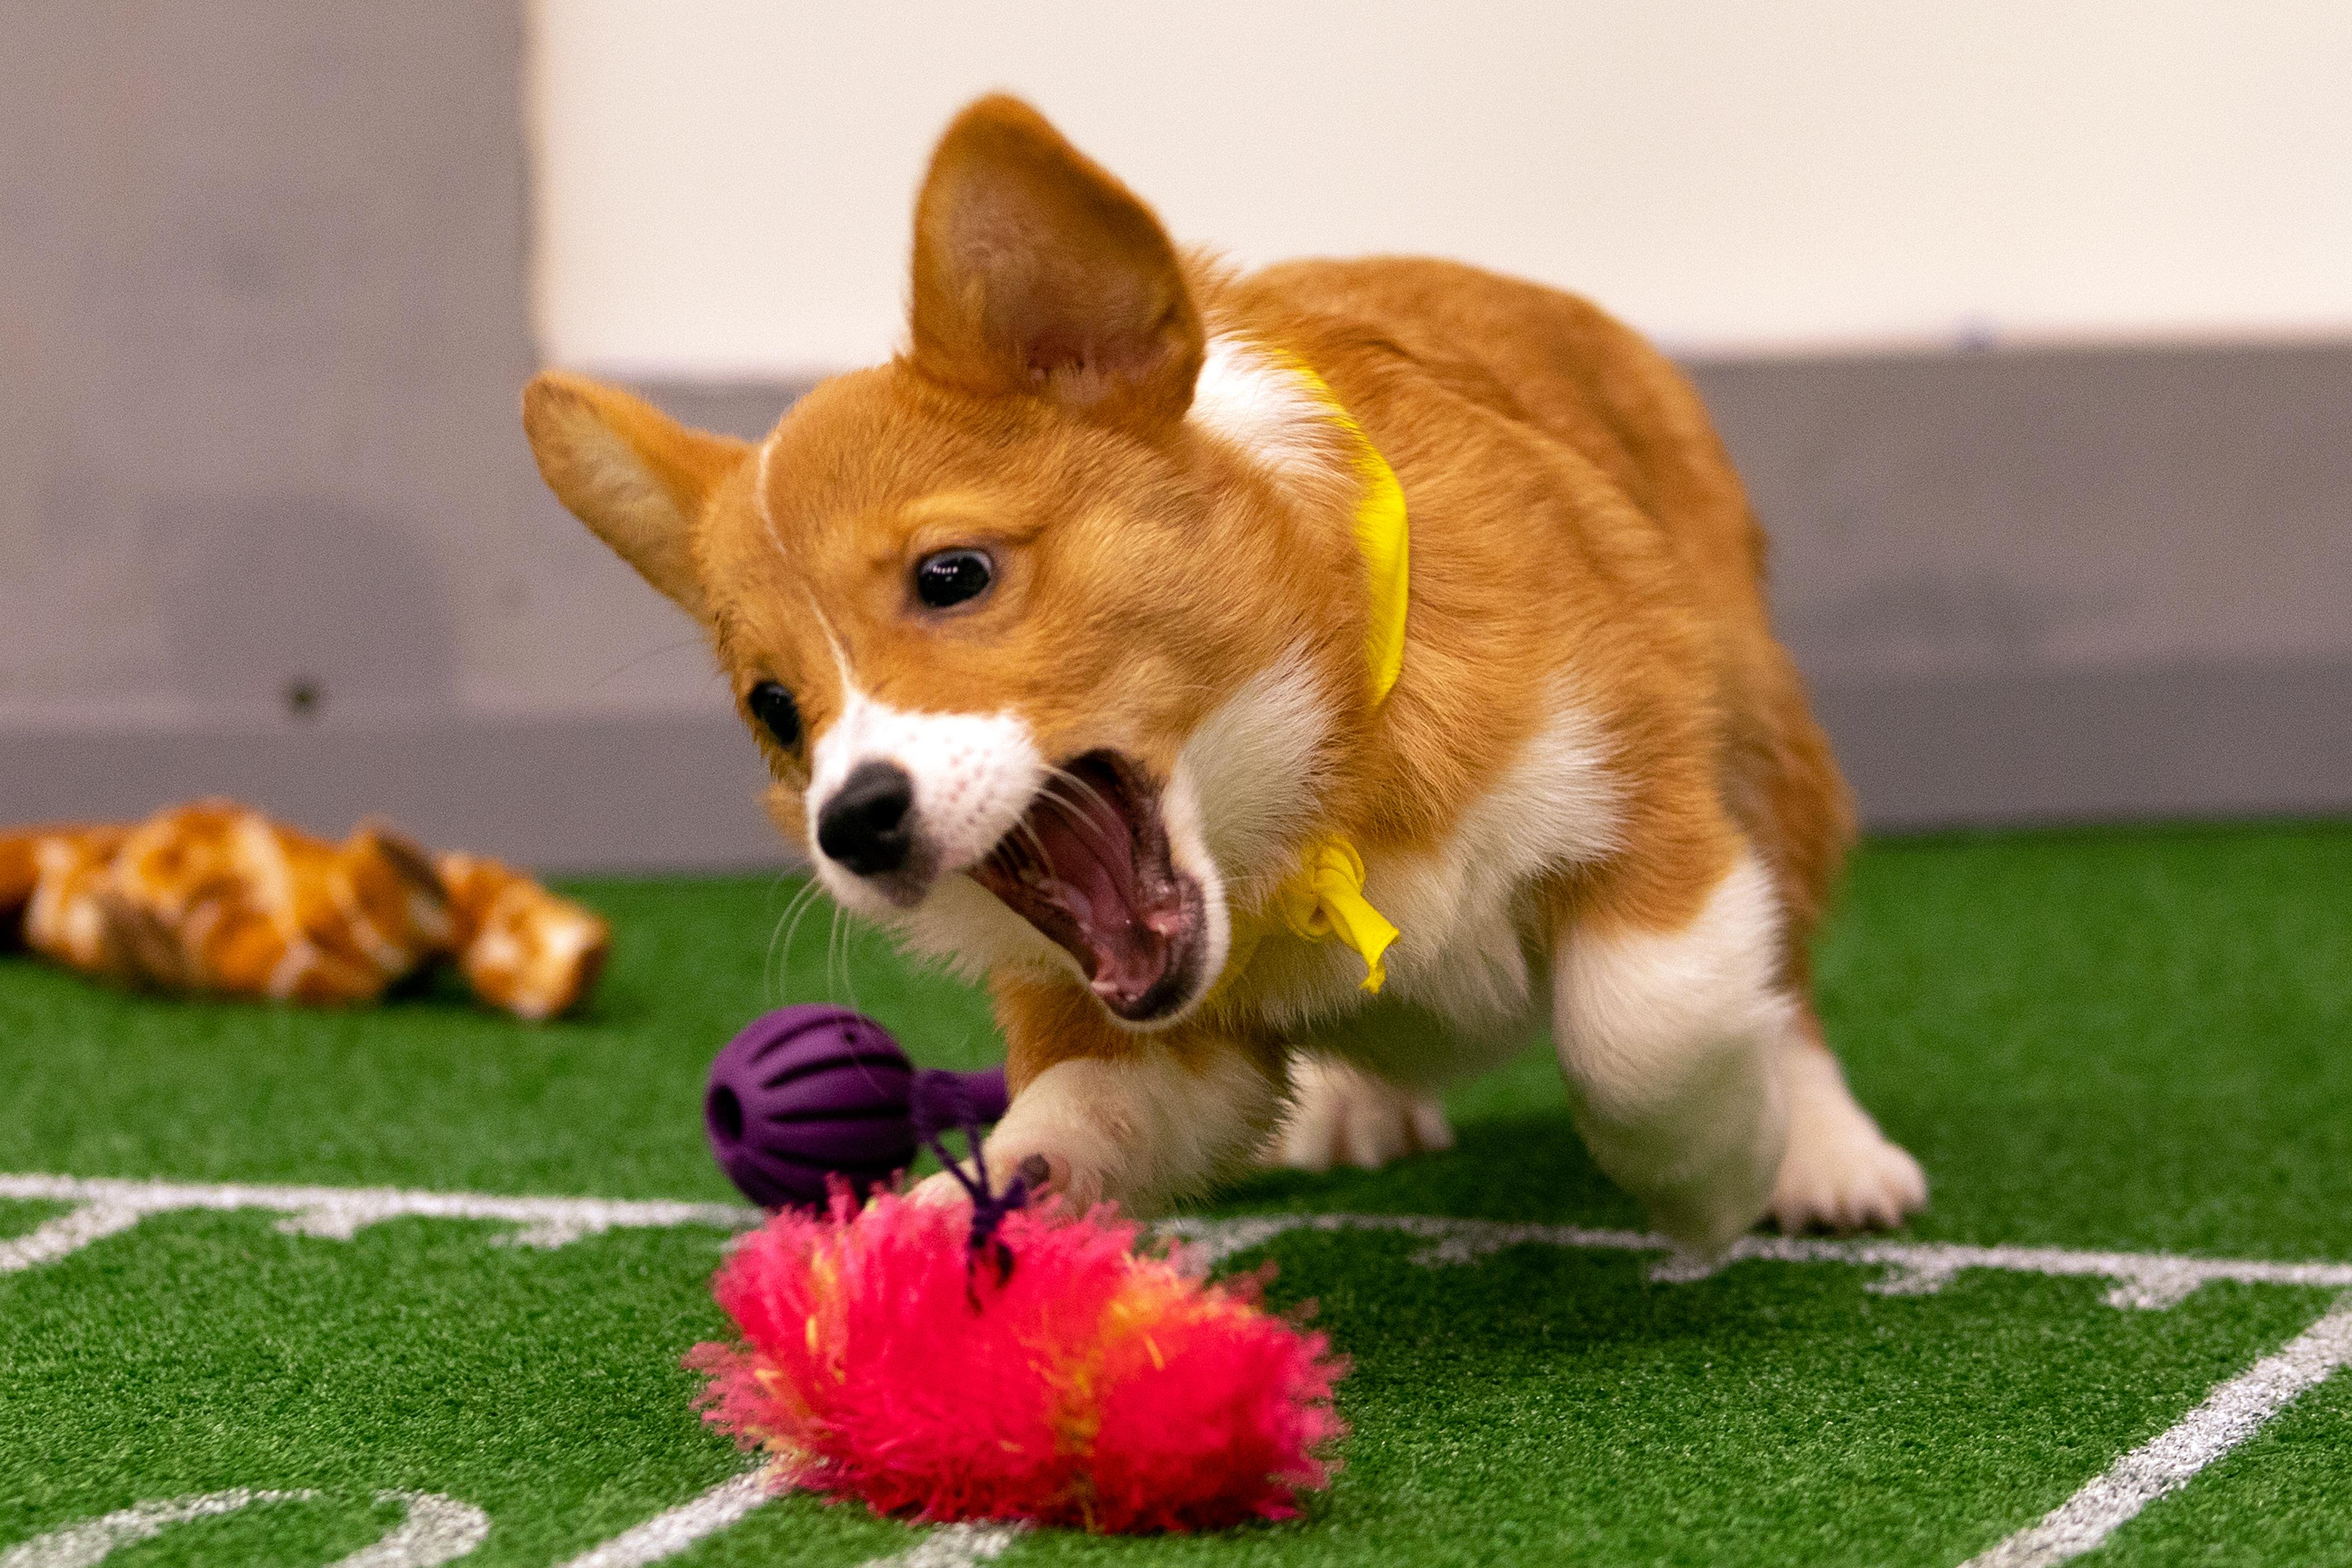 Corgi puppy playing at the 2019 Puppy Bowl